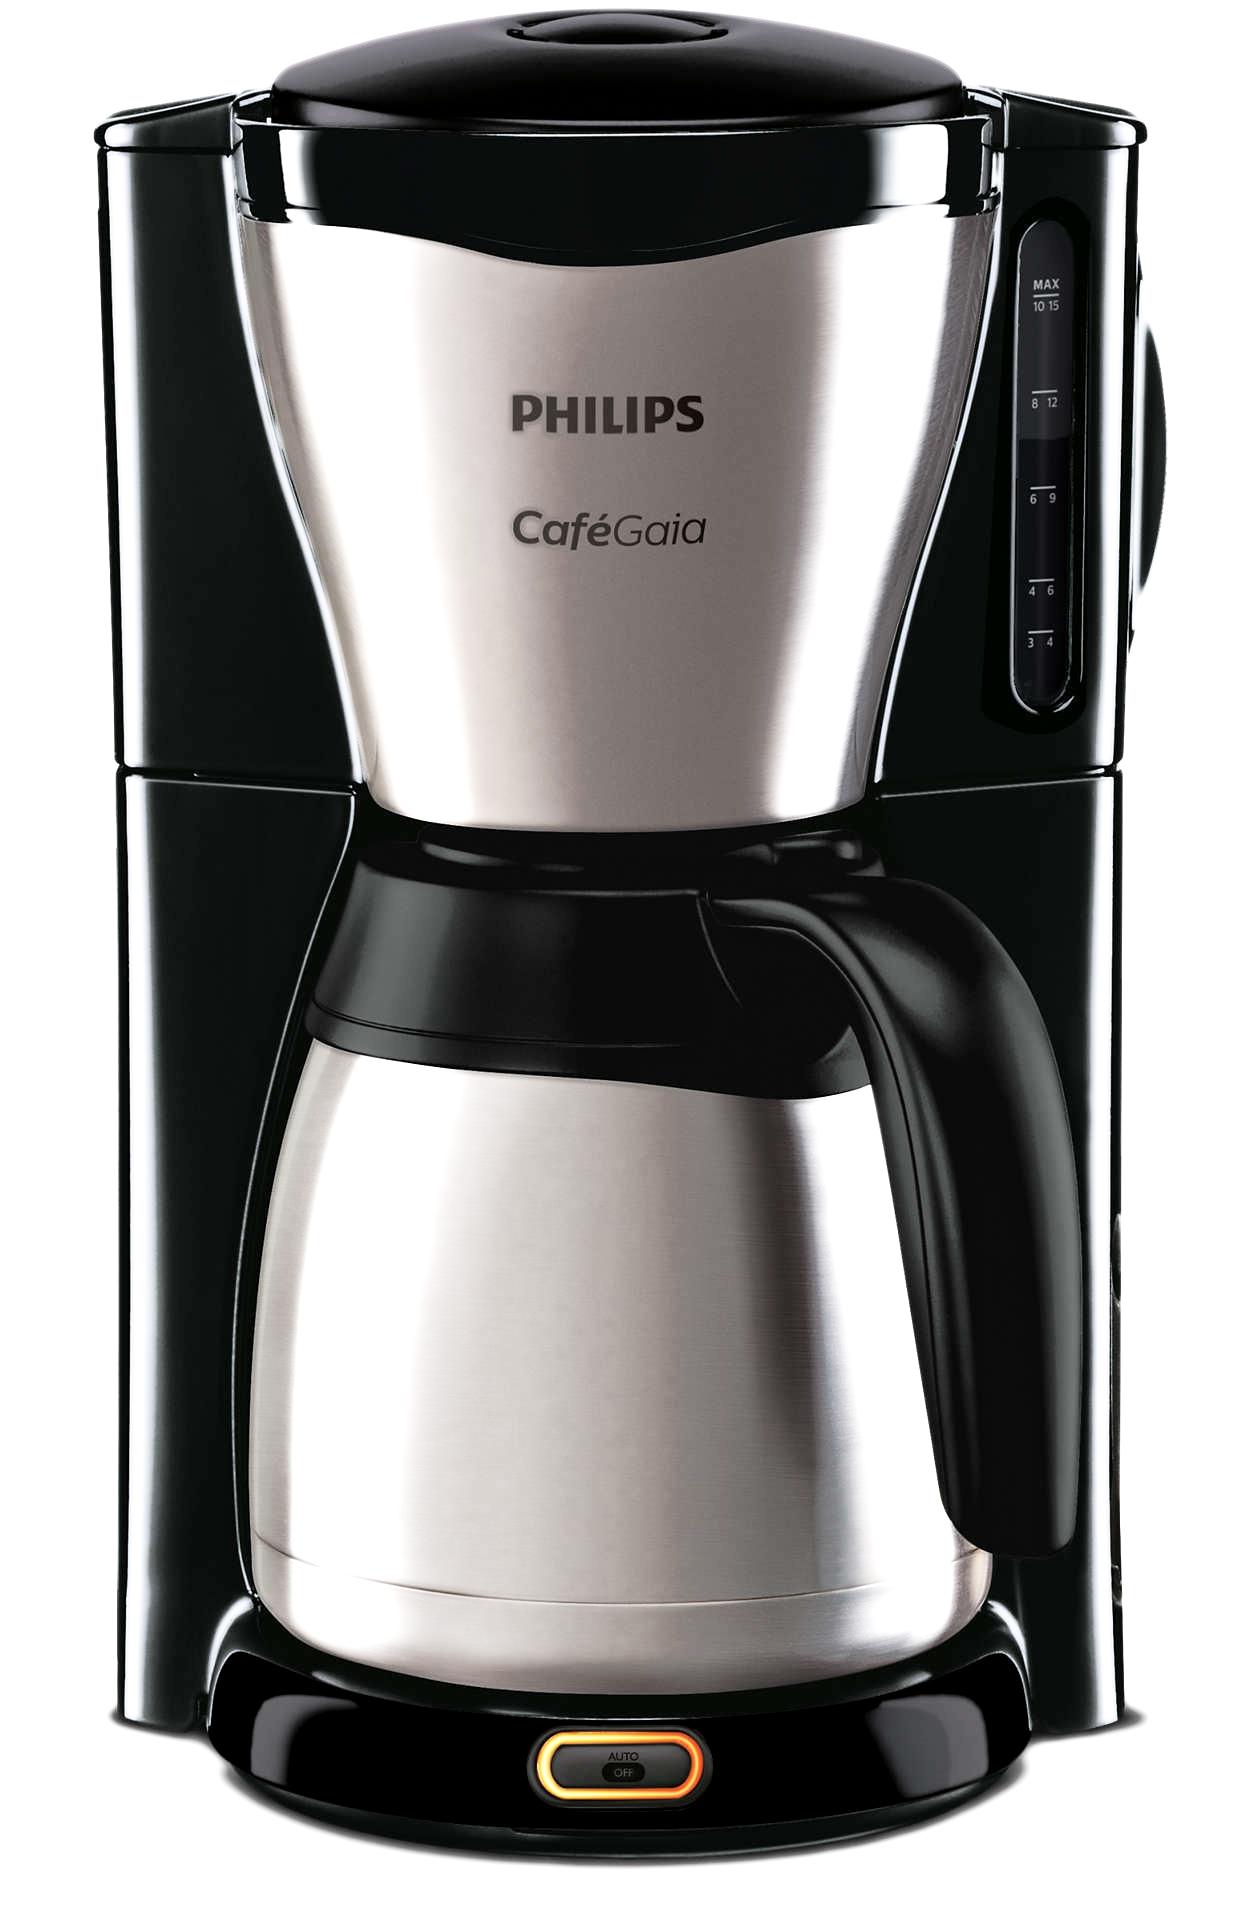 philips kaffee filtermaschine hd 7546 20 gaia edelstahl ebay. Black Bedroom Furniture Sets. Home Design Ideas